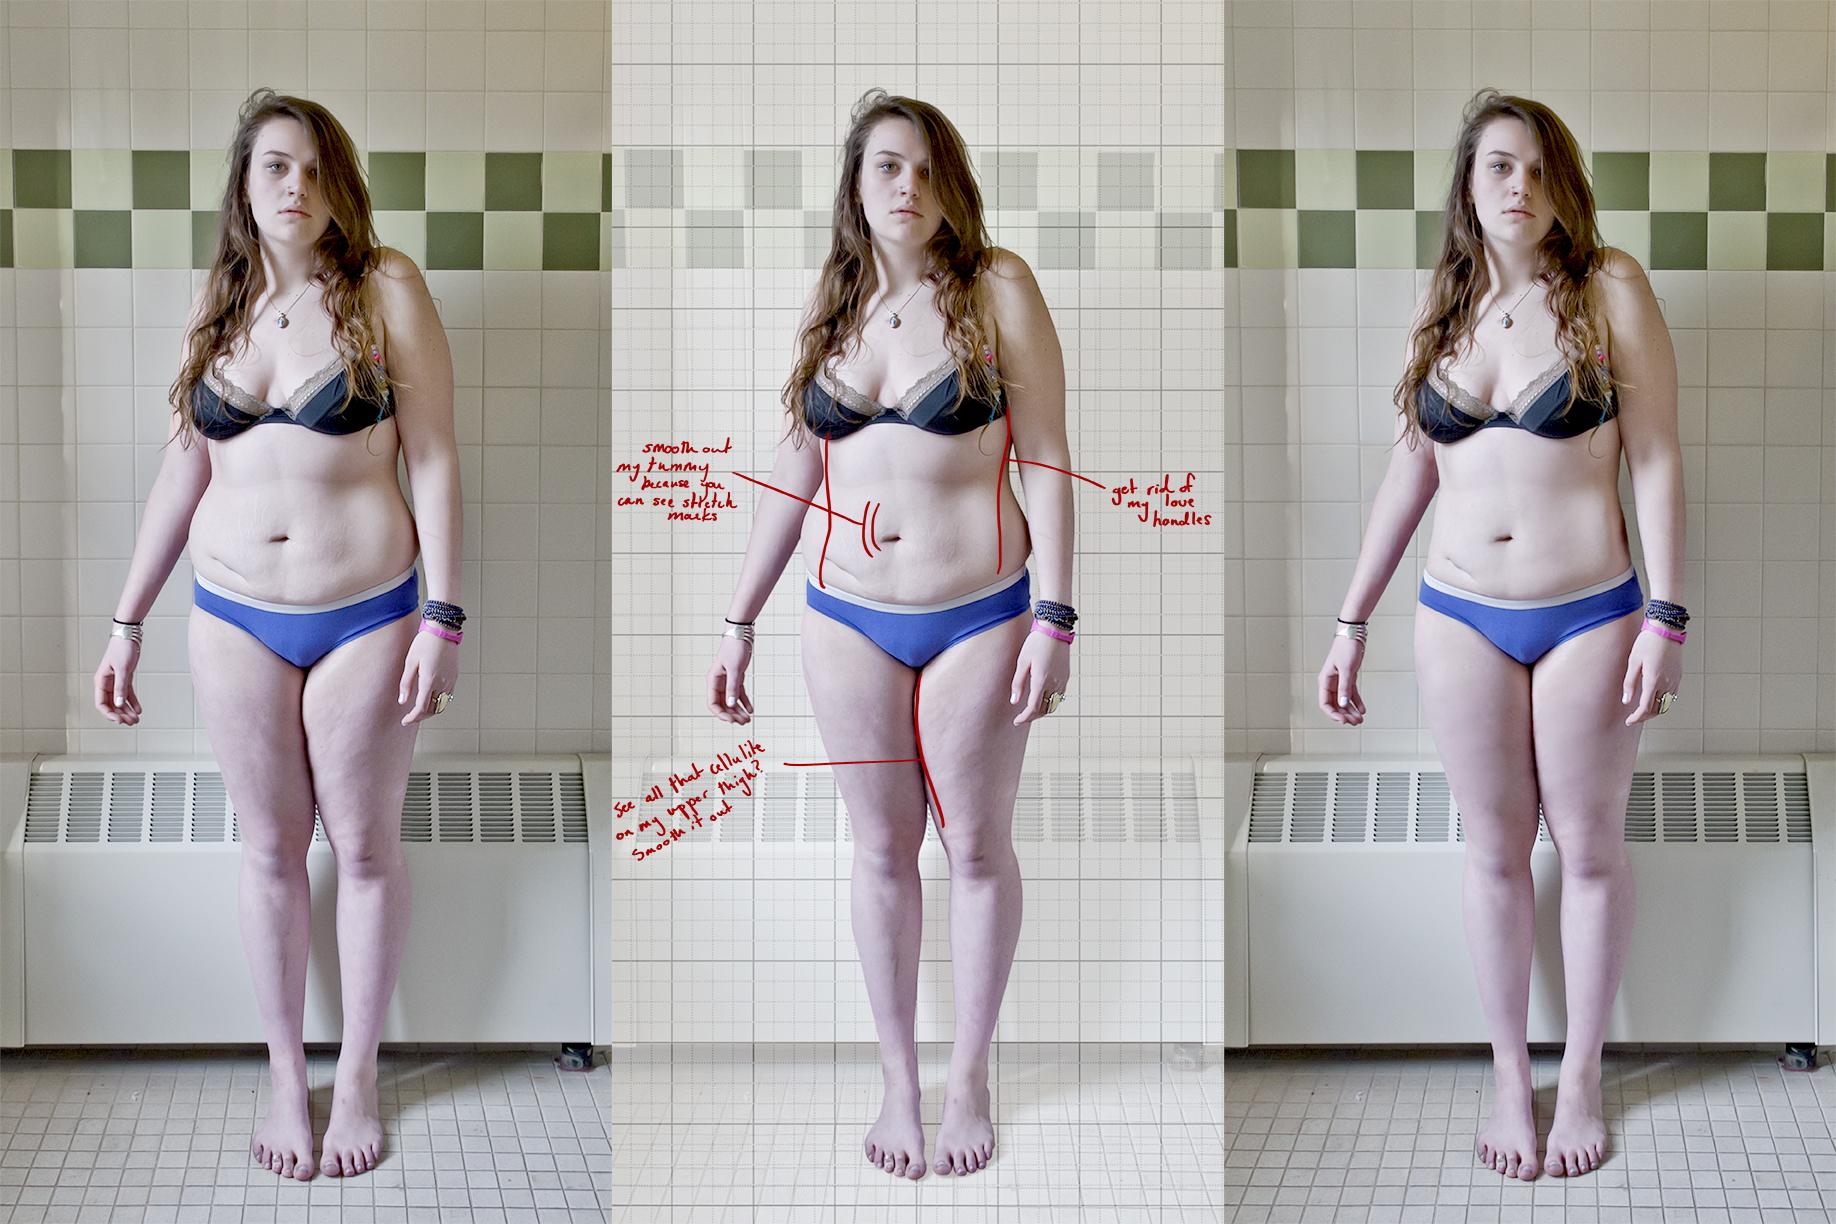 Body image -